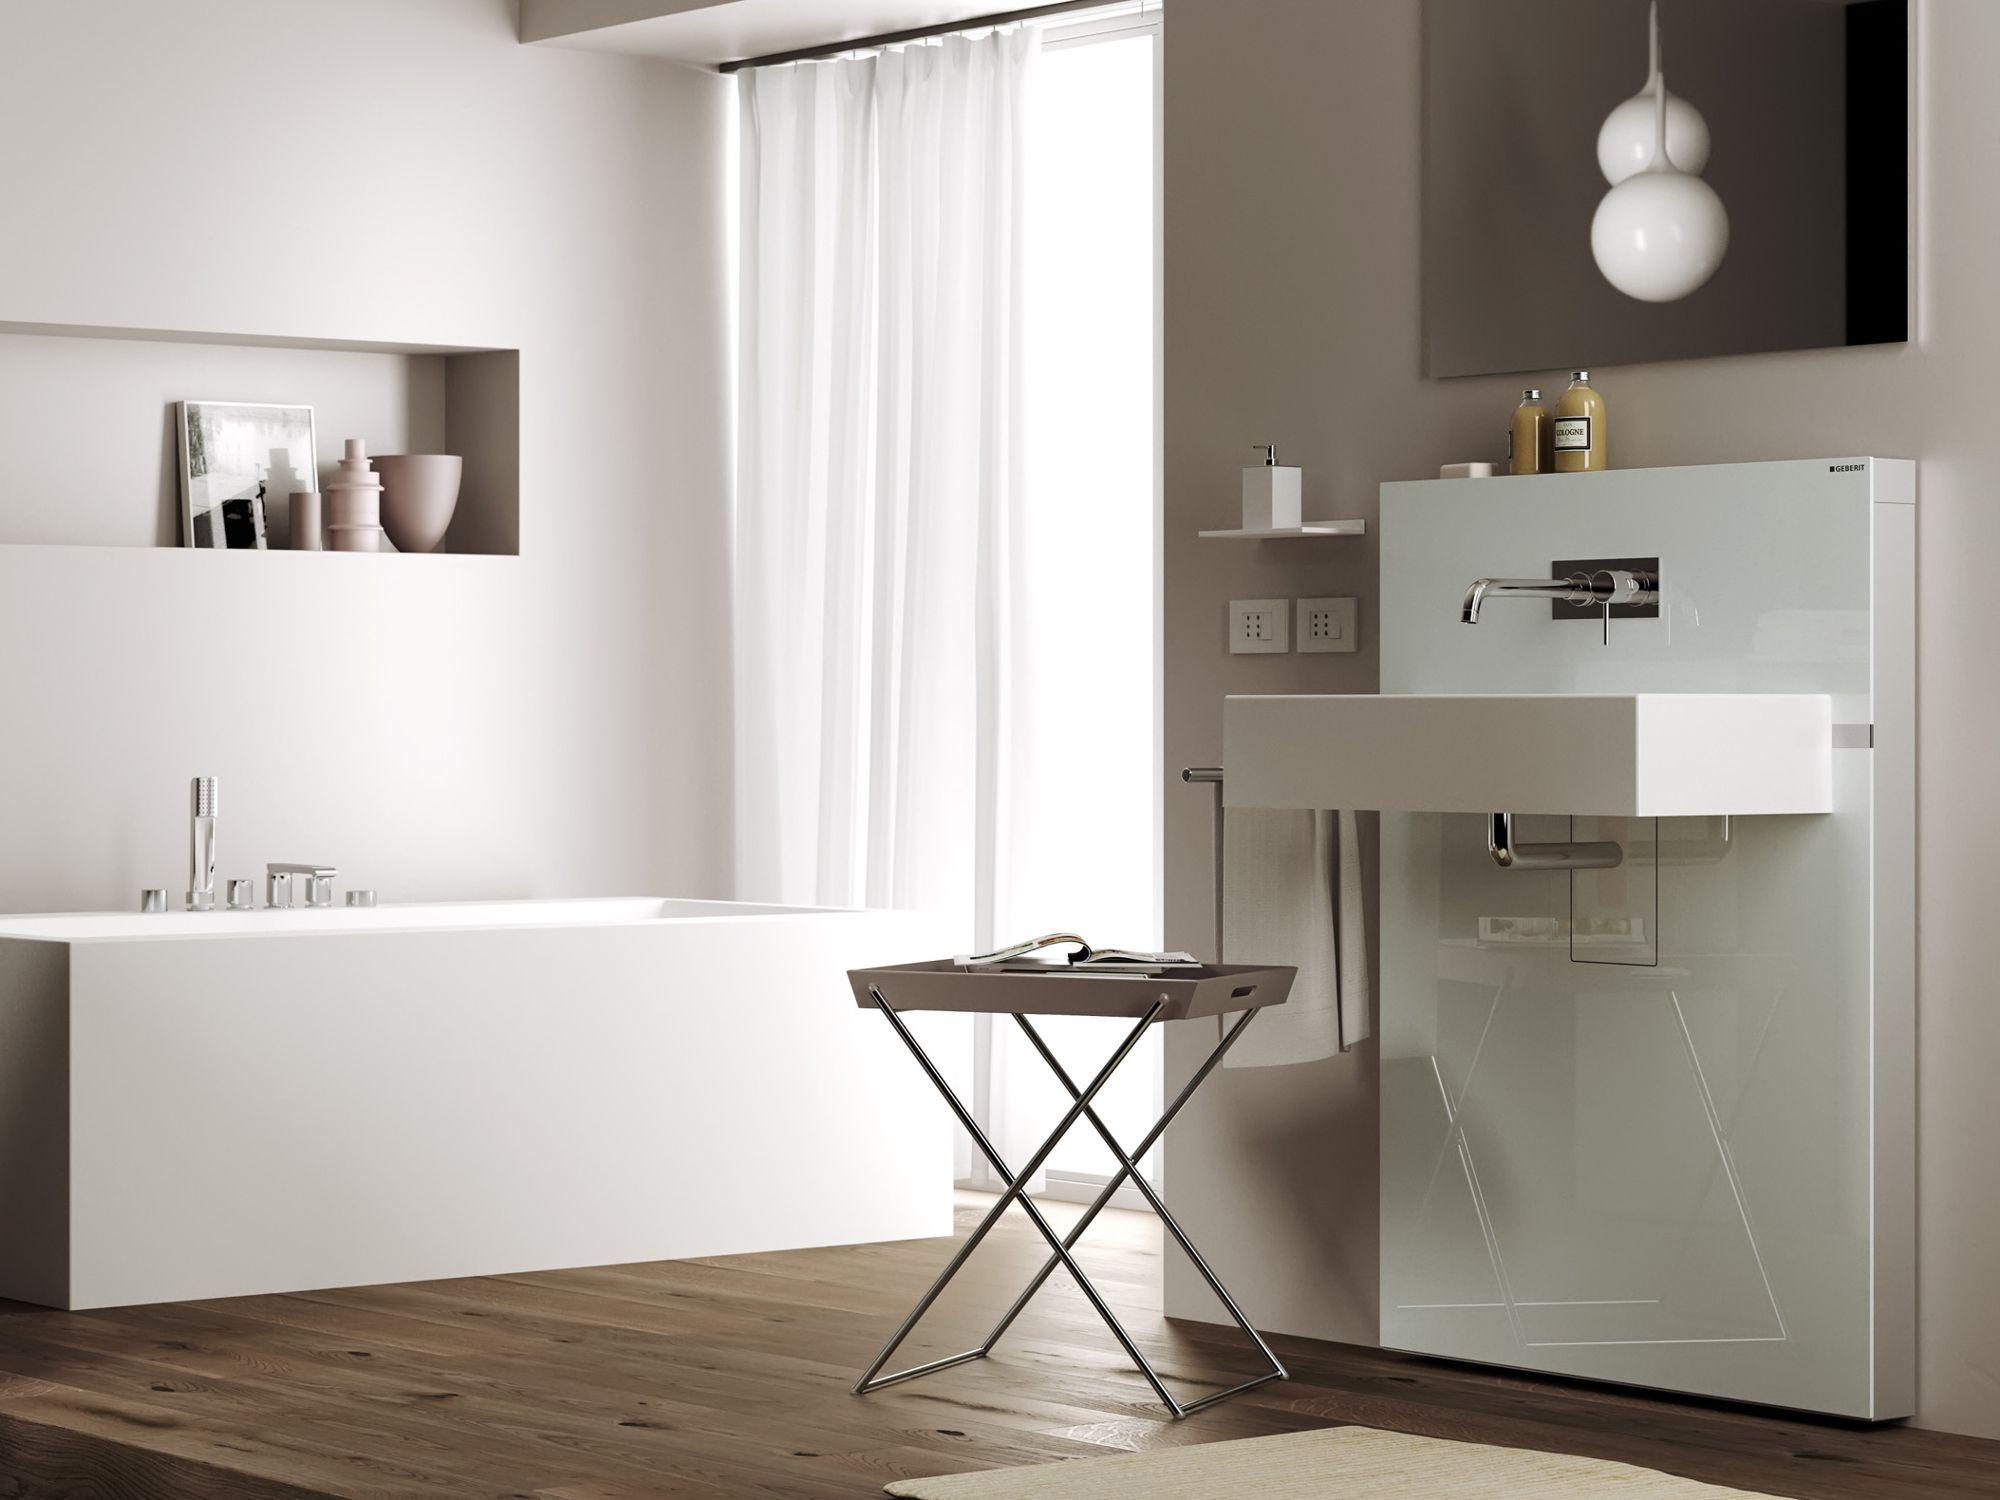 Monolith module sanitaire pour lavabo by geberit italia for Geberit italia